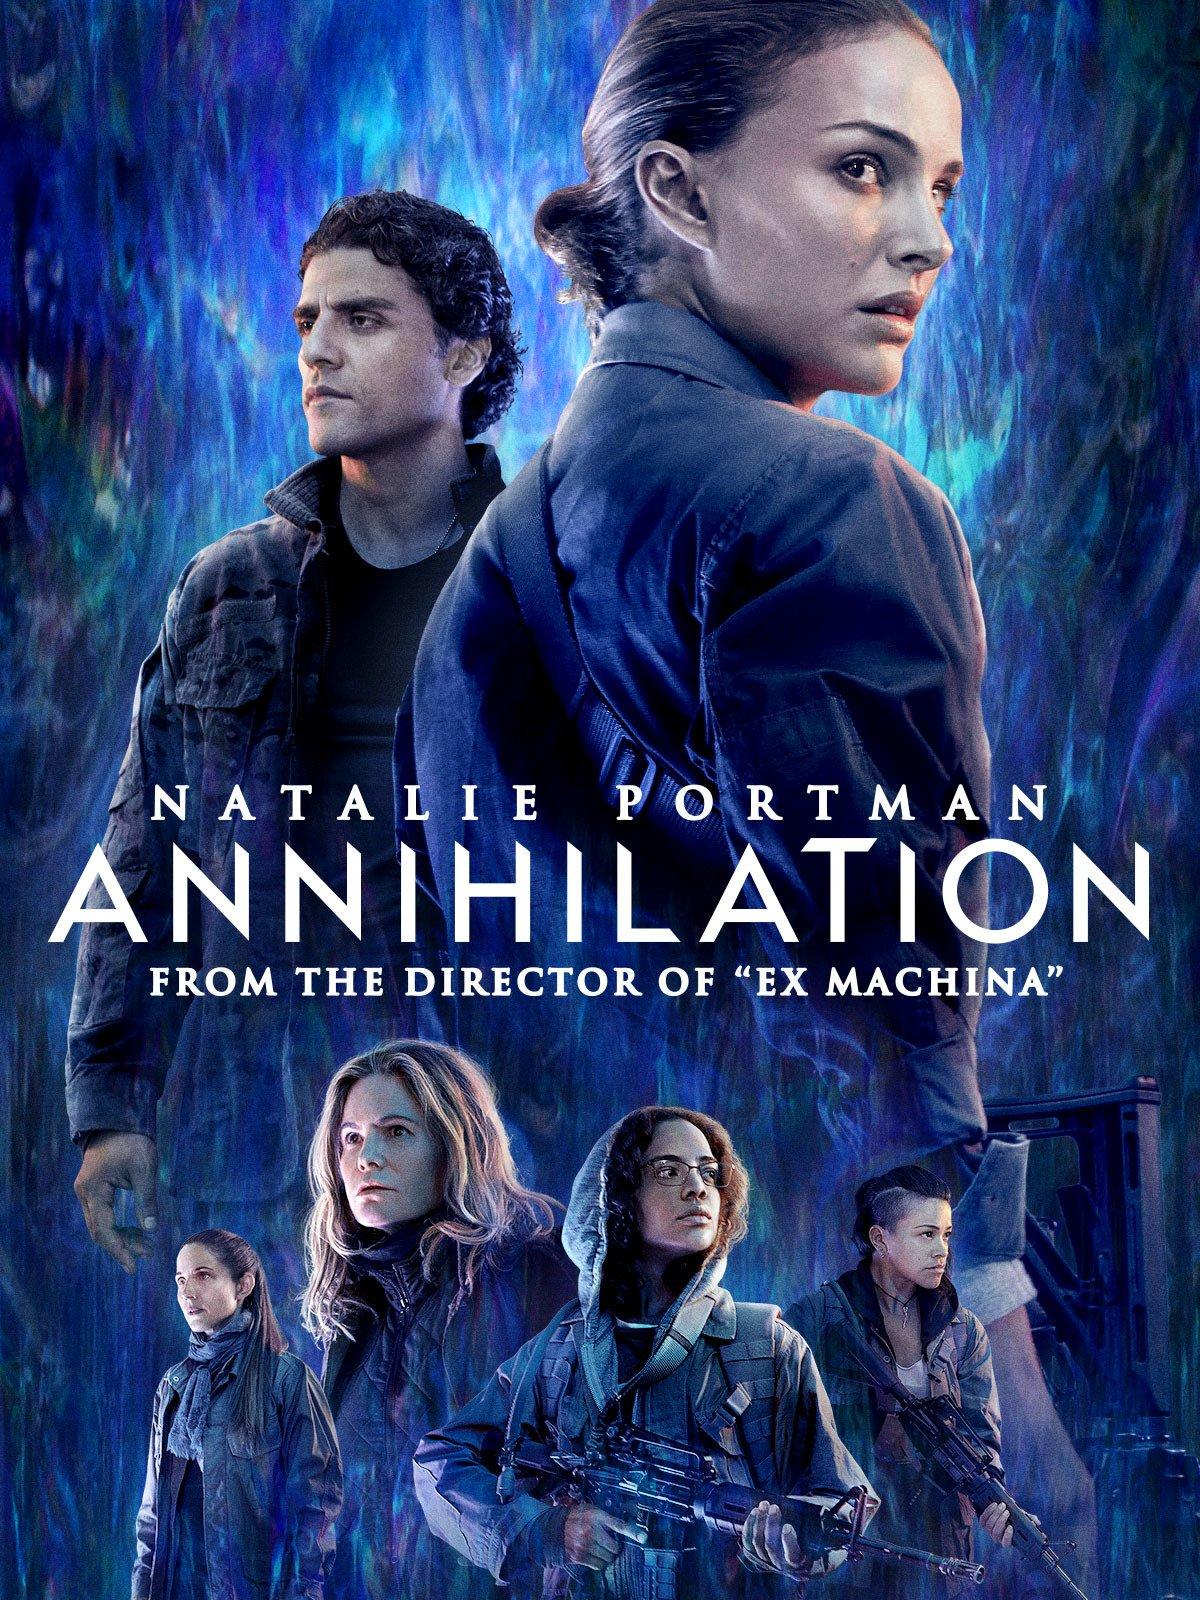 Amazon.com: Annihilation: Natalie Portman, Jennifer Jason Leigh ...